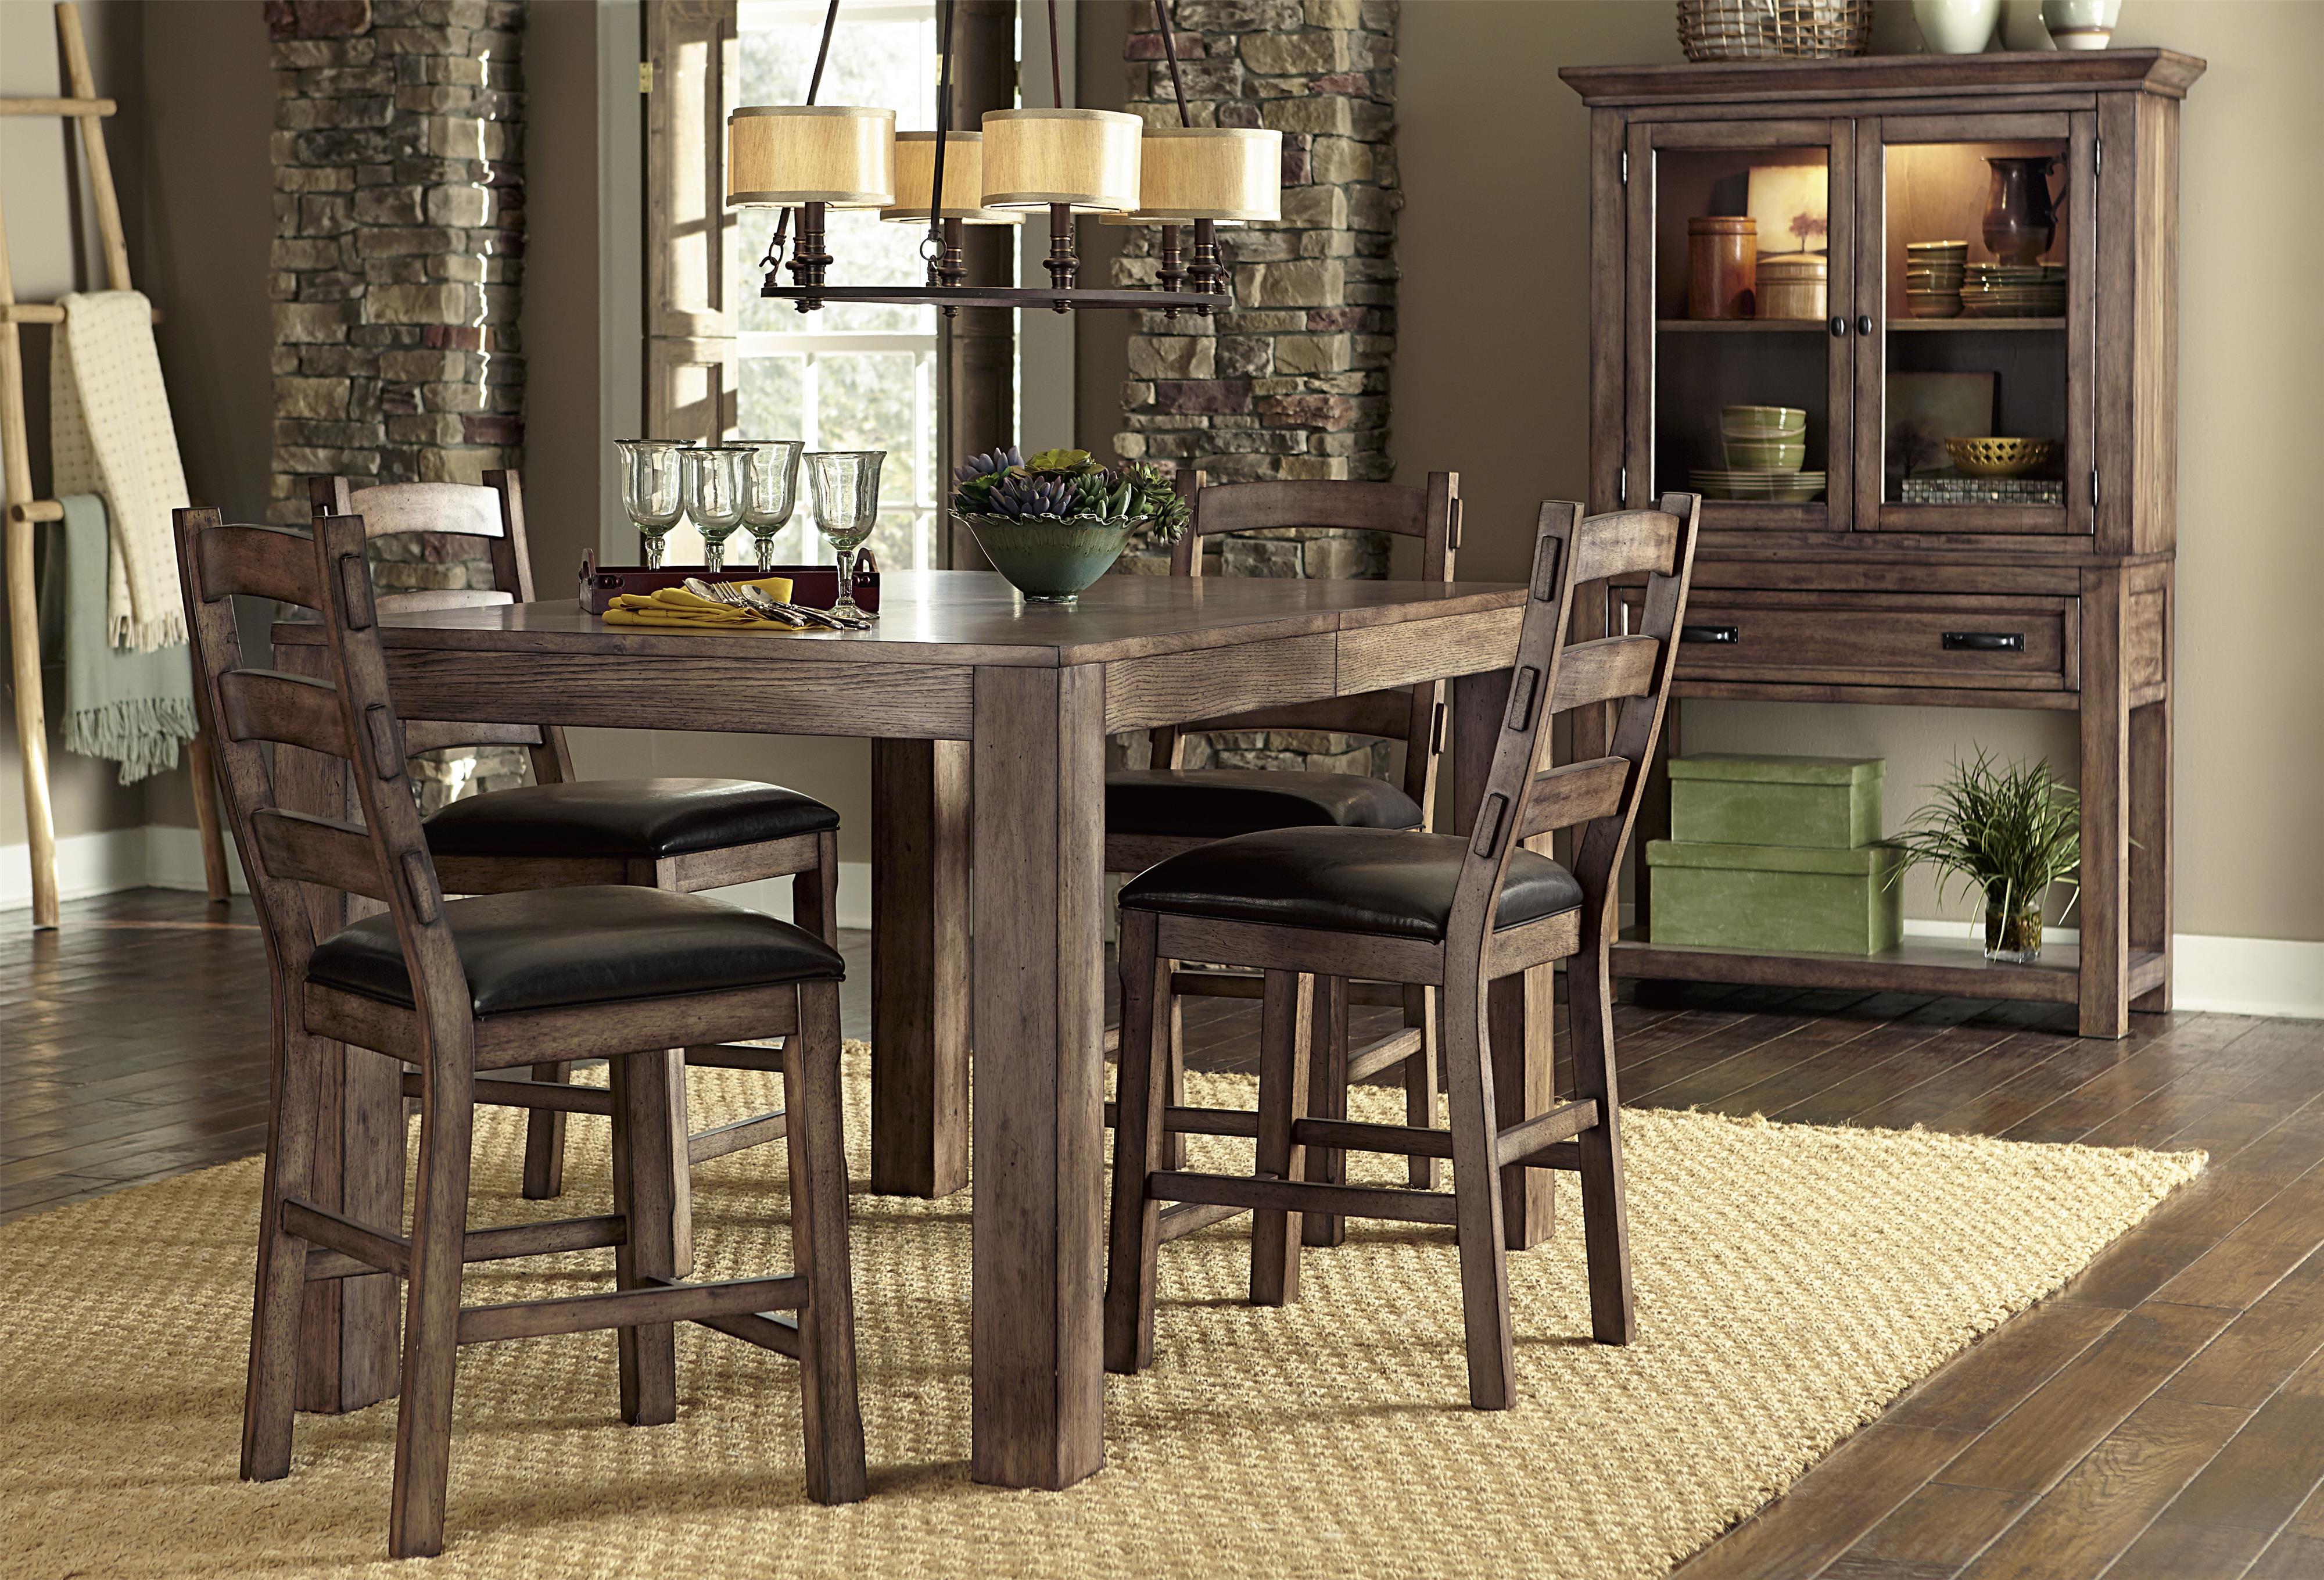 Progressive Furniture Boulder Creek Casual Dining Room Group - Item Number: P849 Dining Room Group 3